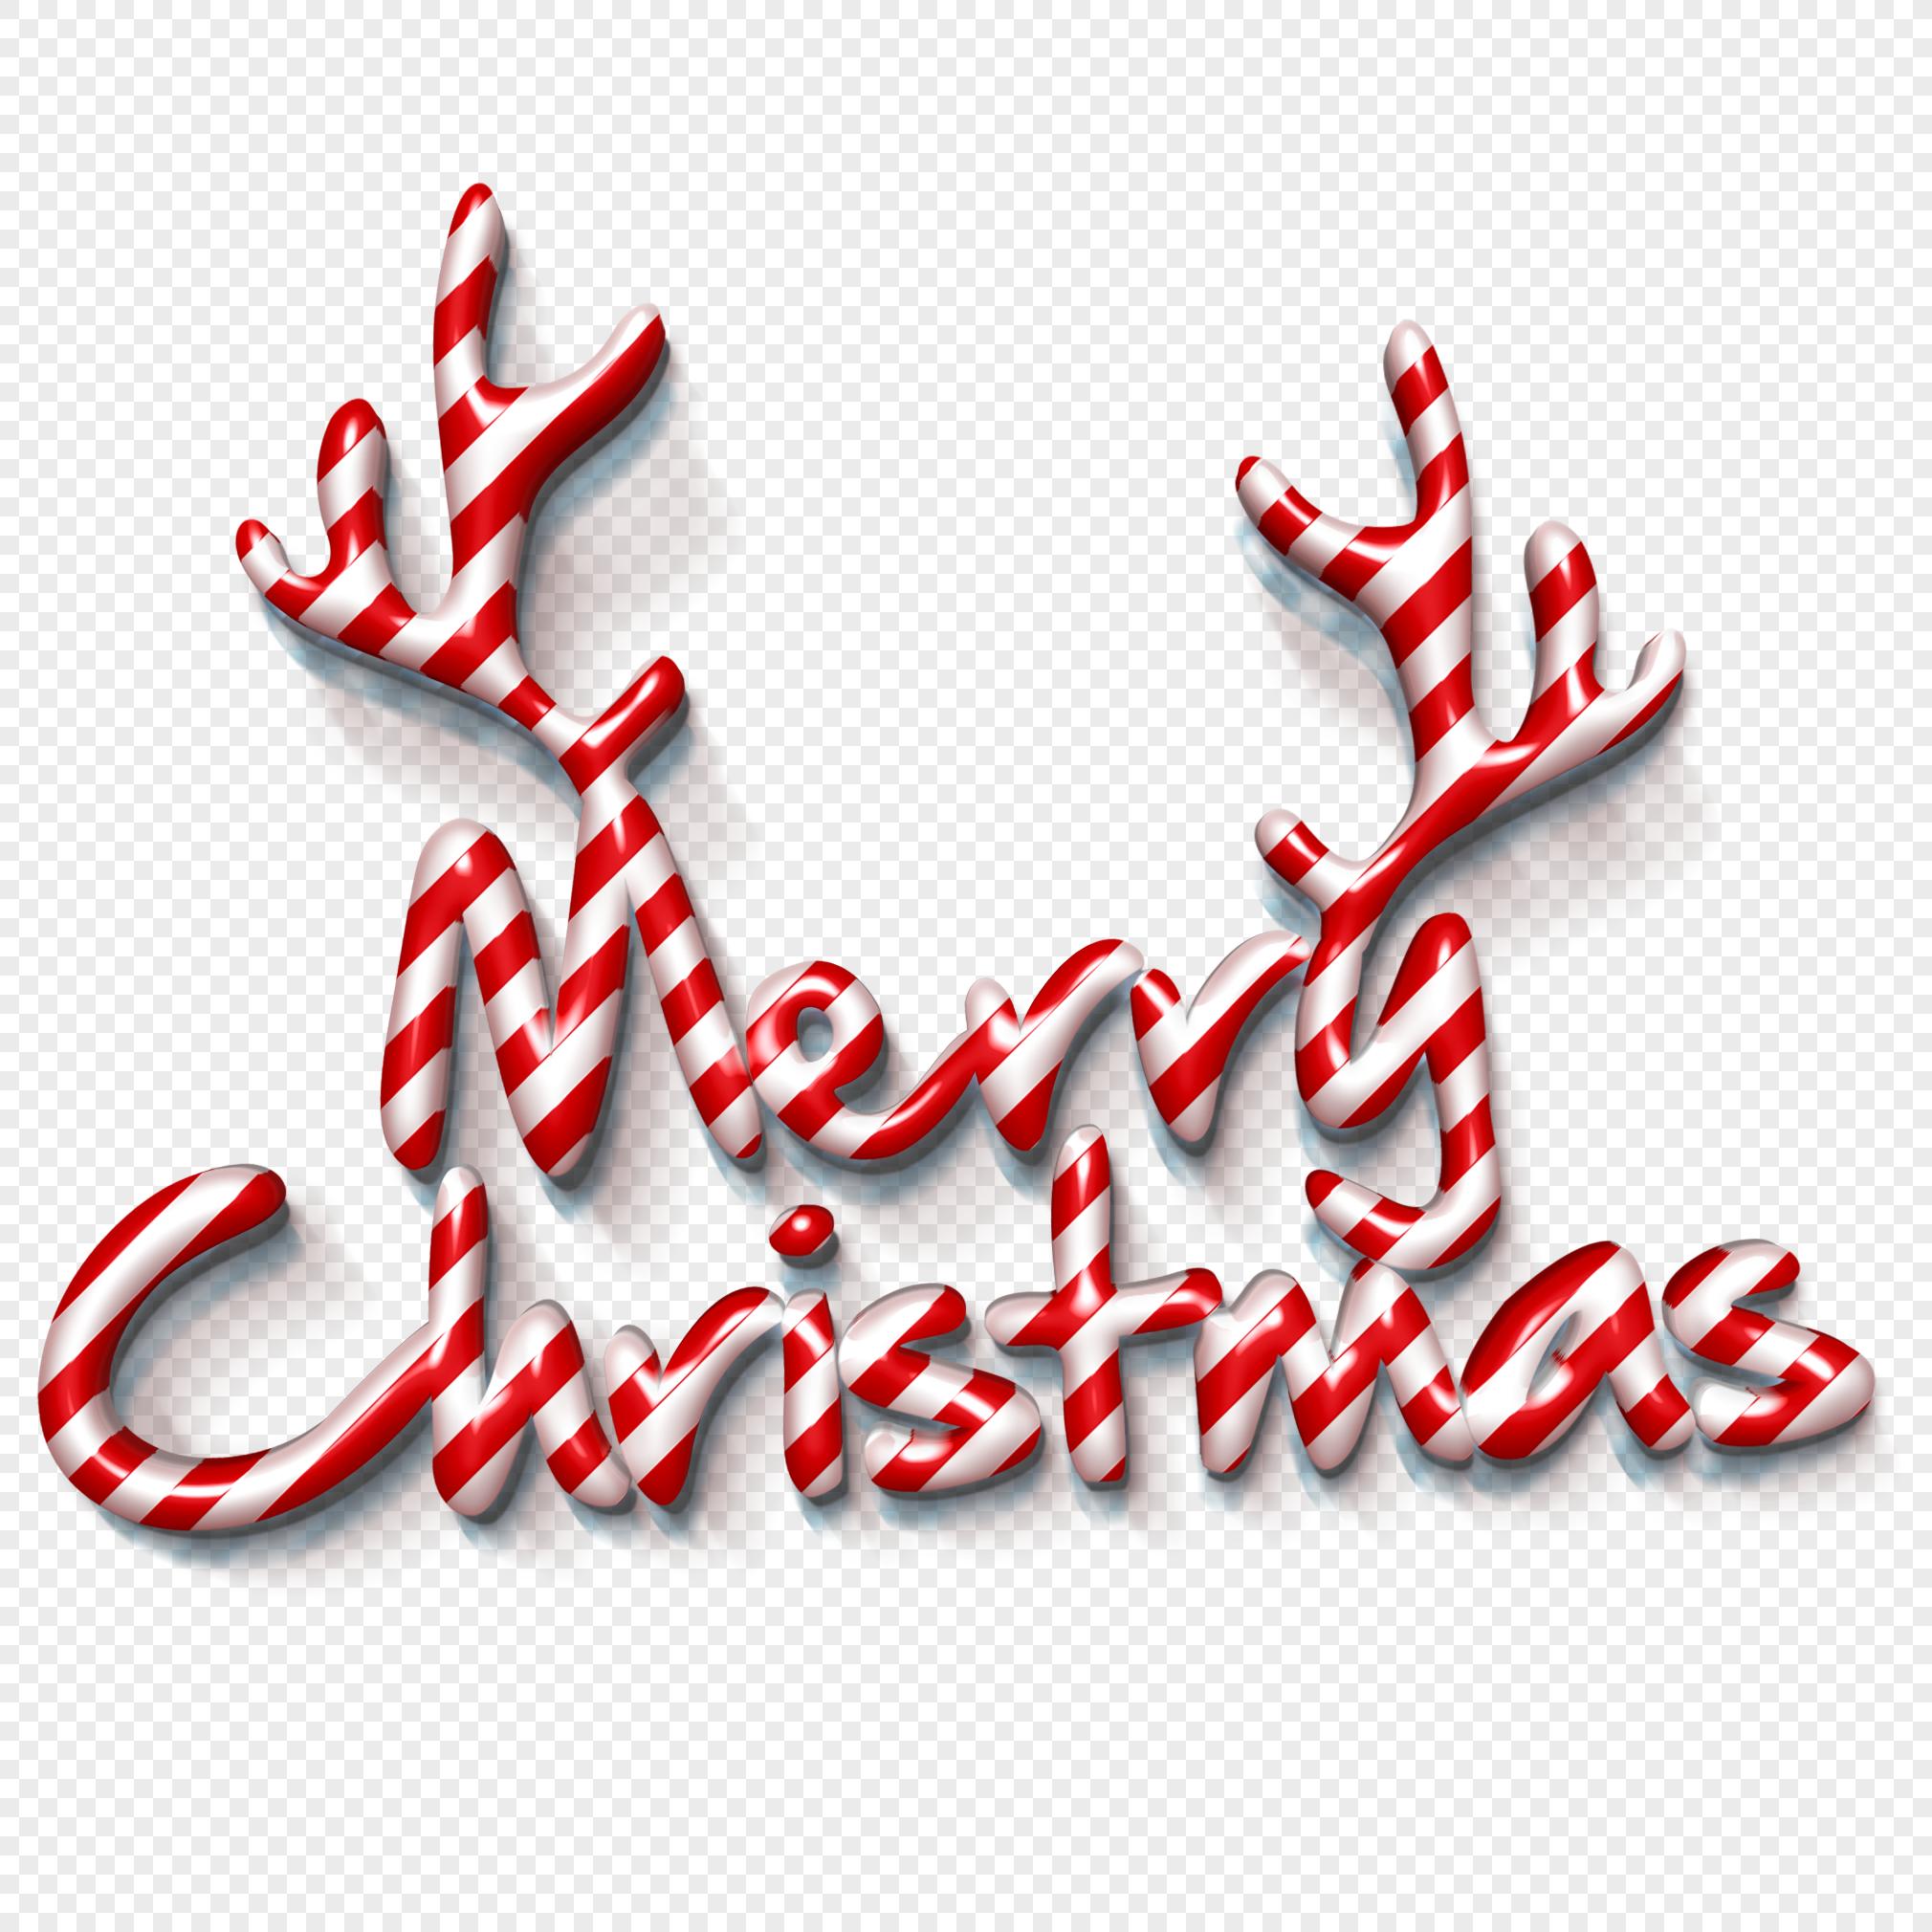 christmas fonts christmas font generator - HD2020×2020